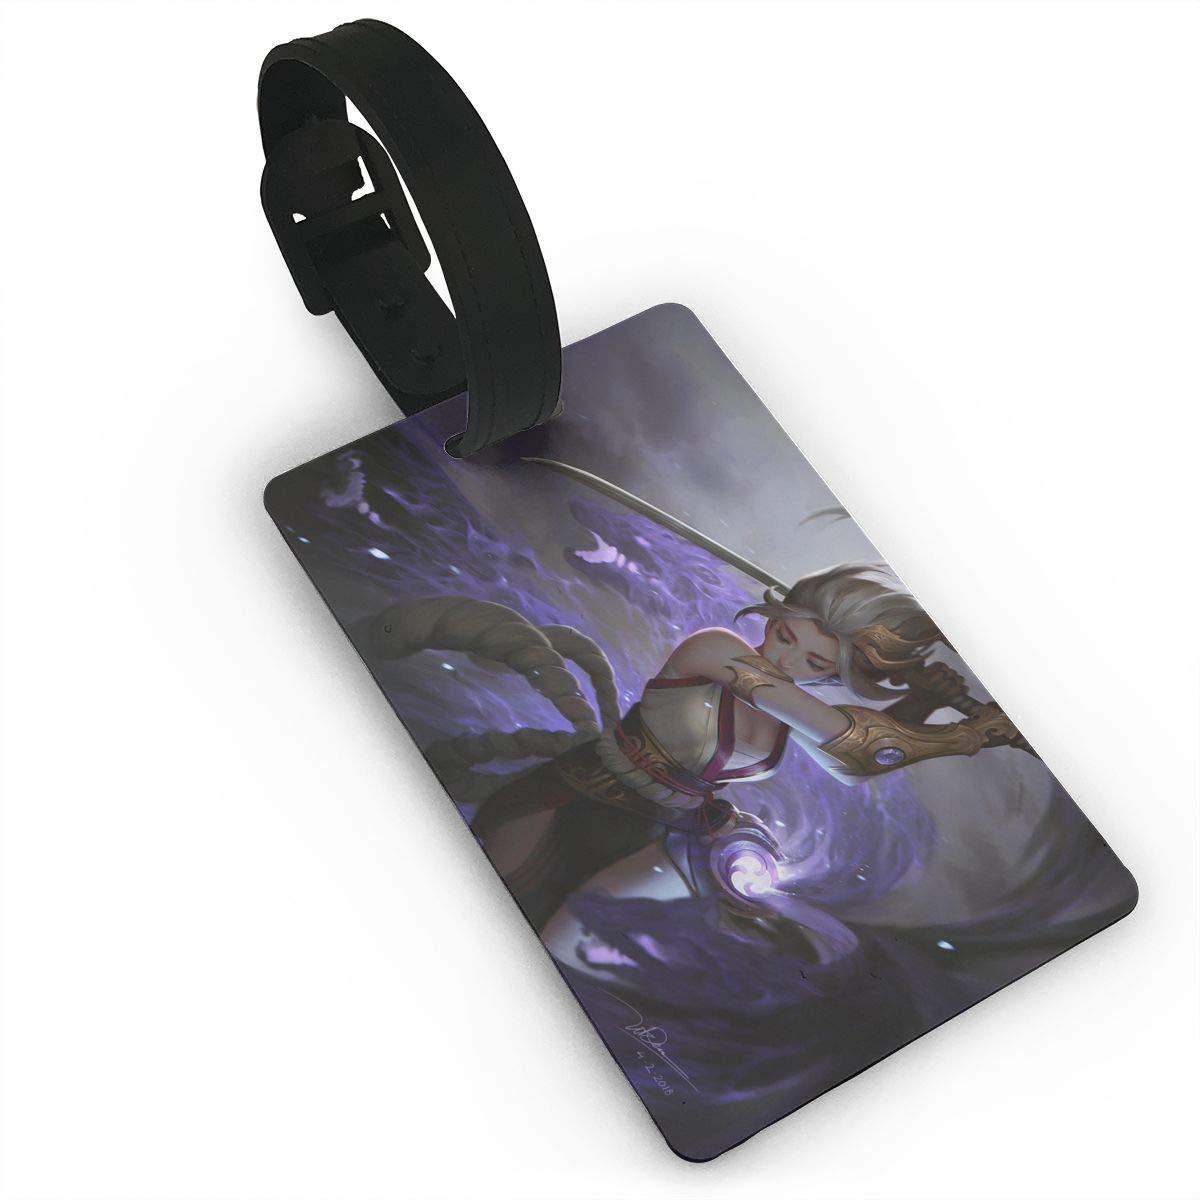 Amazon.com: JimHappy Luggage Tag Murasaki Digital Fantasy ...